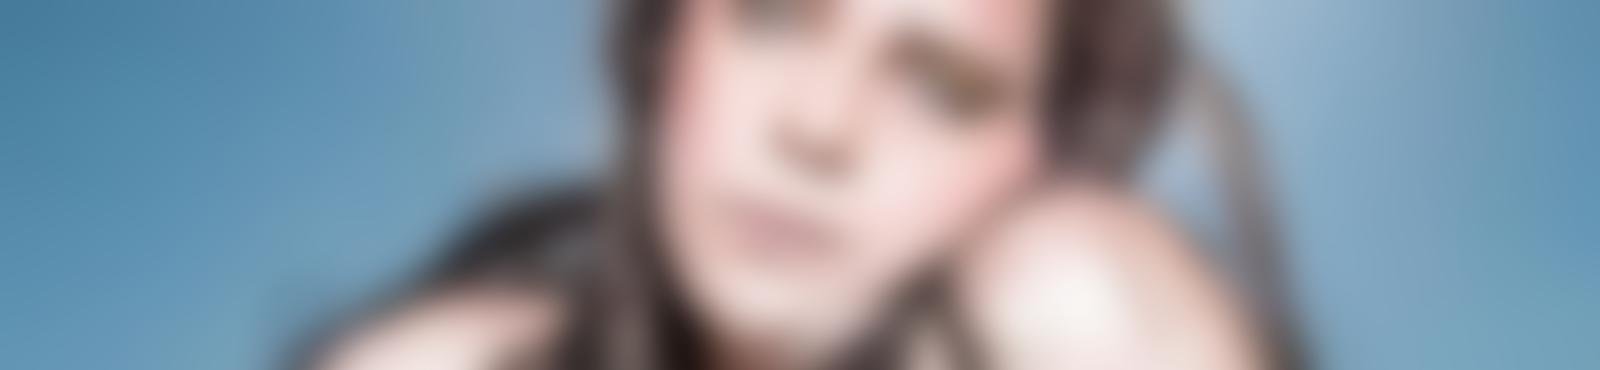 Blurred 9f6c0ac9 caa9 4478 aae3 94ca1fc3cd4d